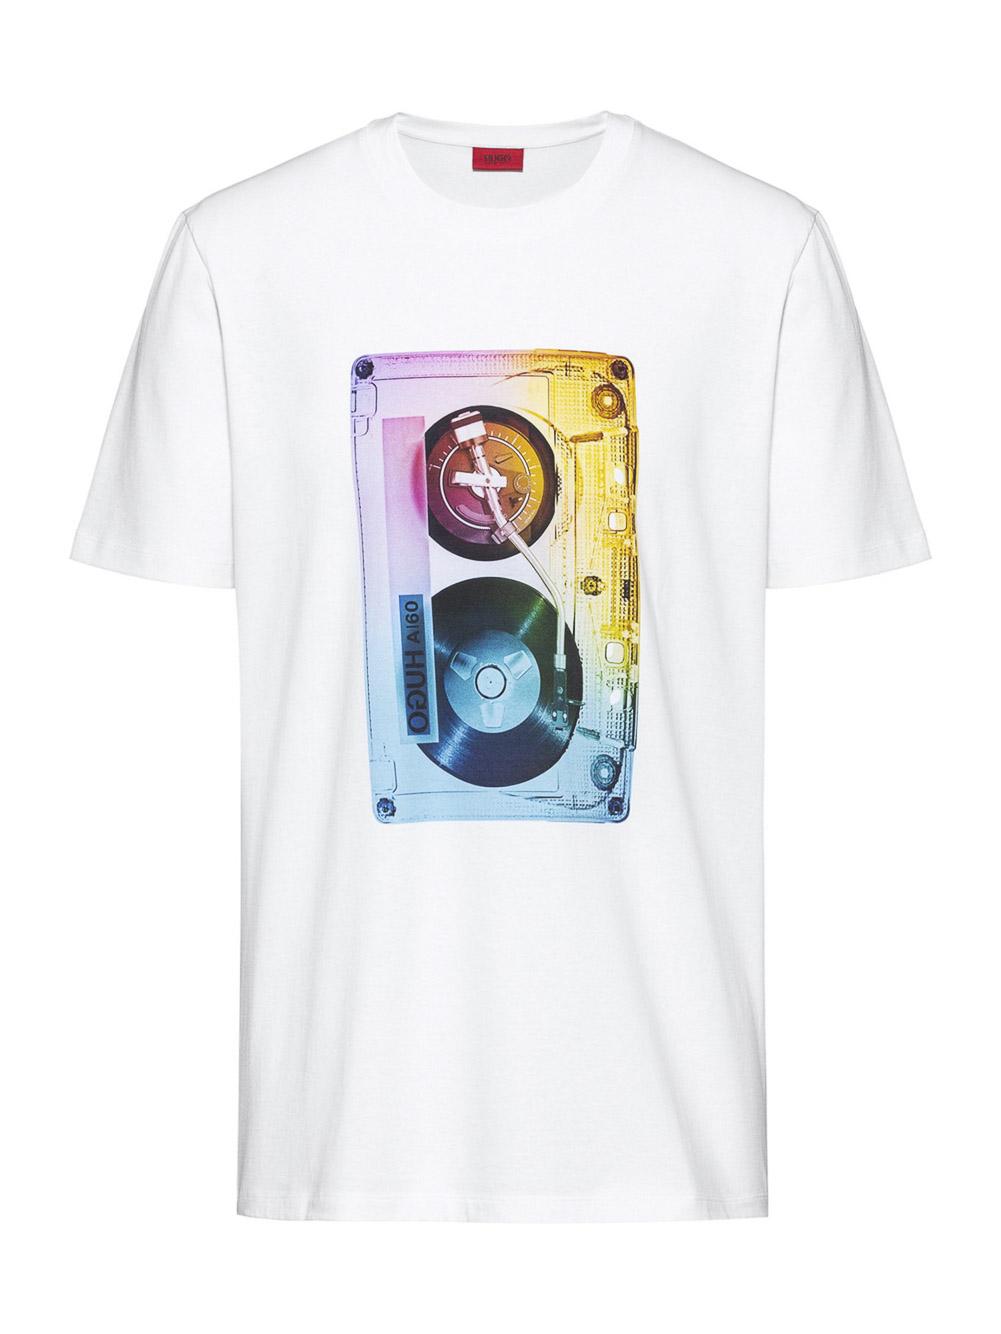 HUGO Μπλούζα T-Shirt 50428216-100 ΛΕΥΚΟ